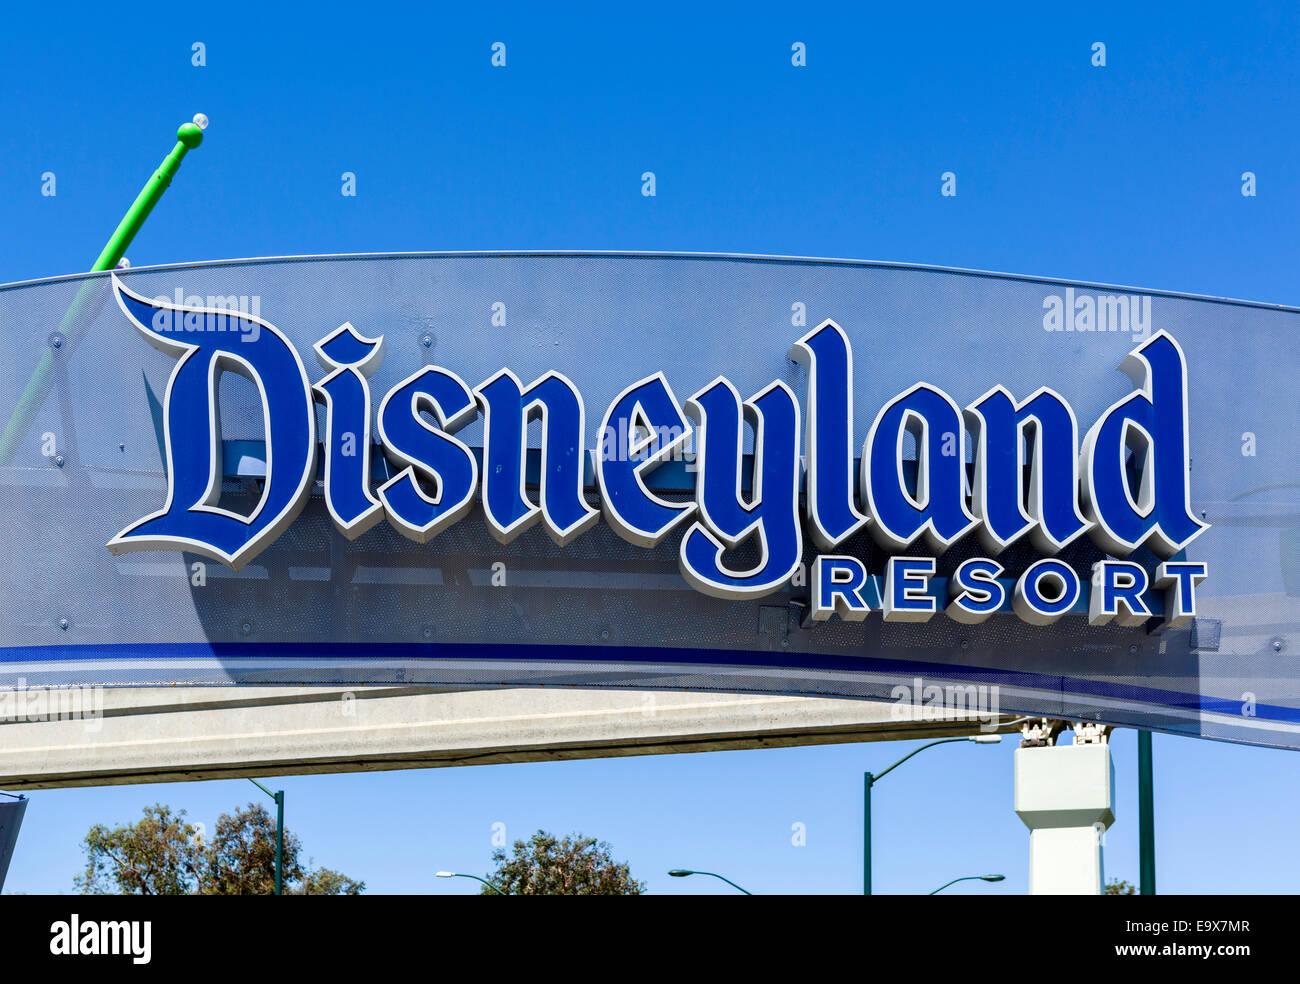 Entrance to Disneyland Resort, Anaheim, Orange County, near Los Angeles, California, USA Stock Photo